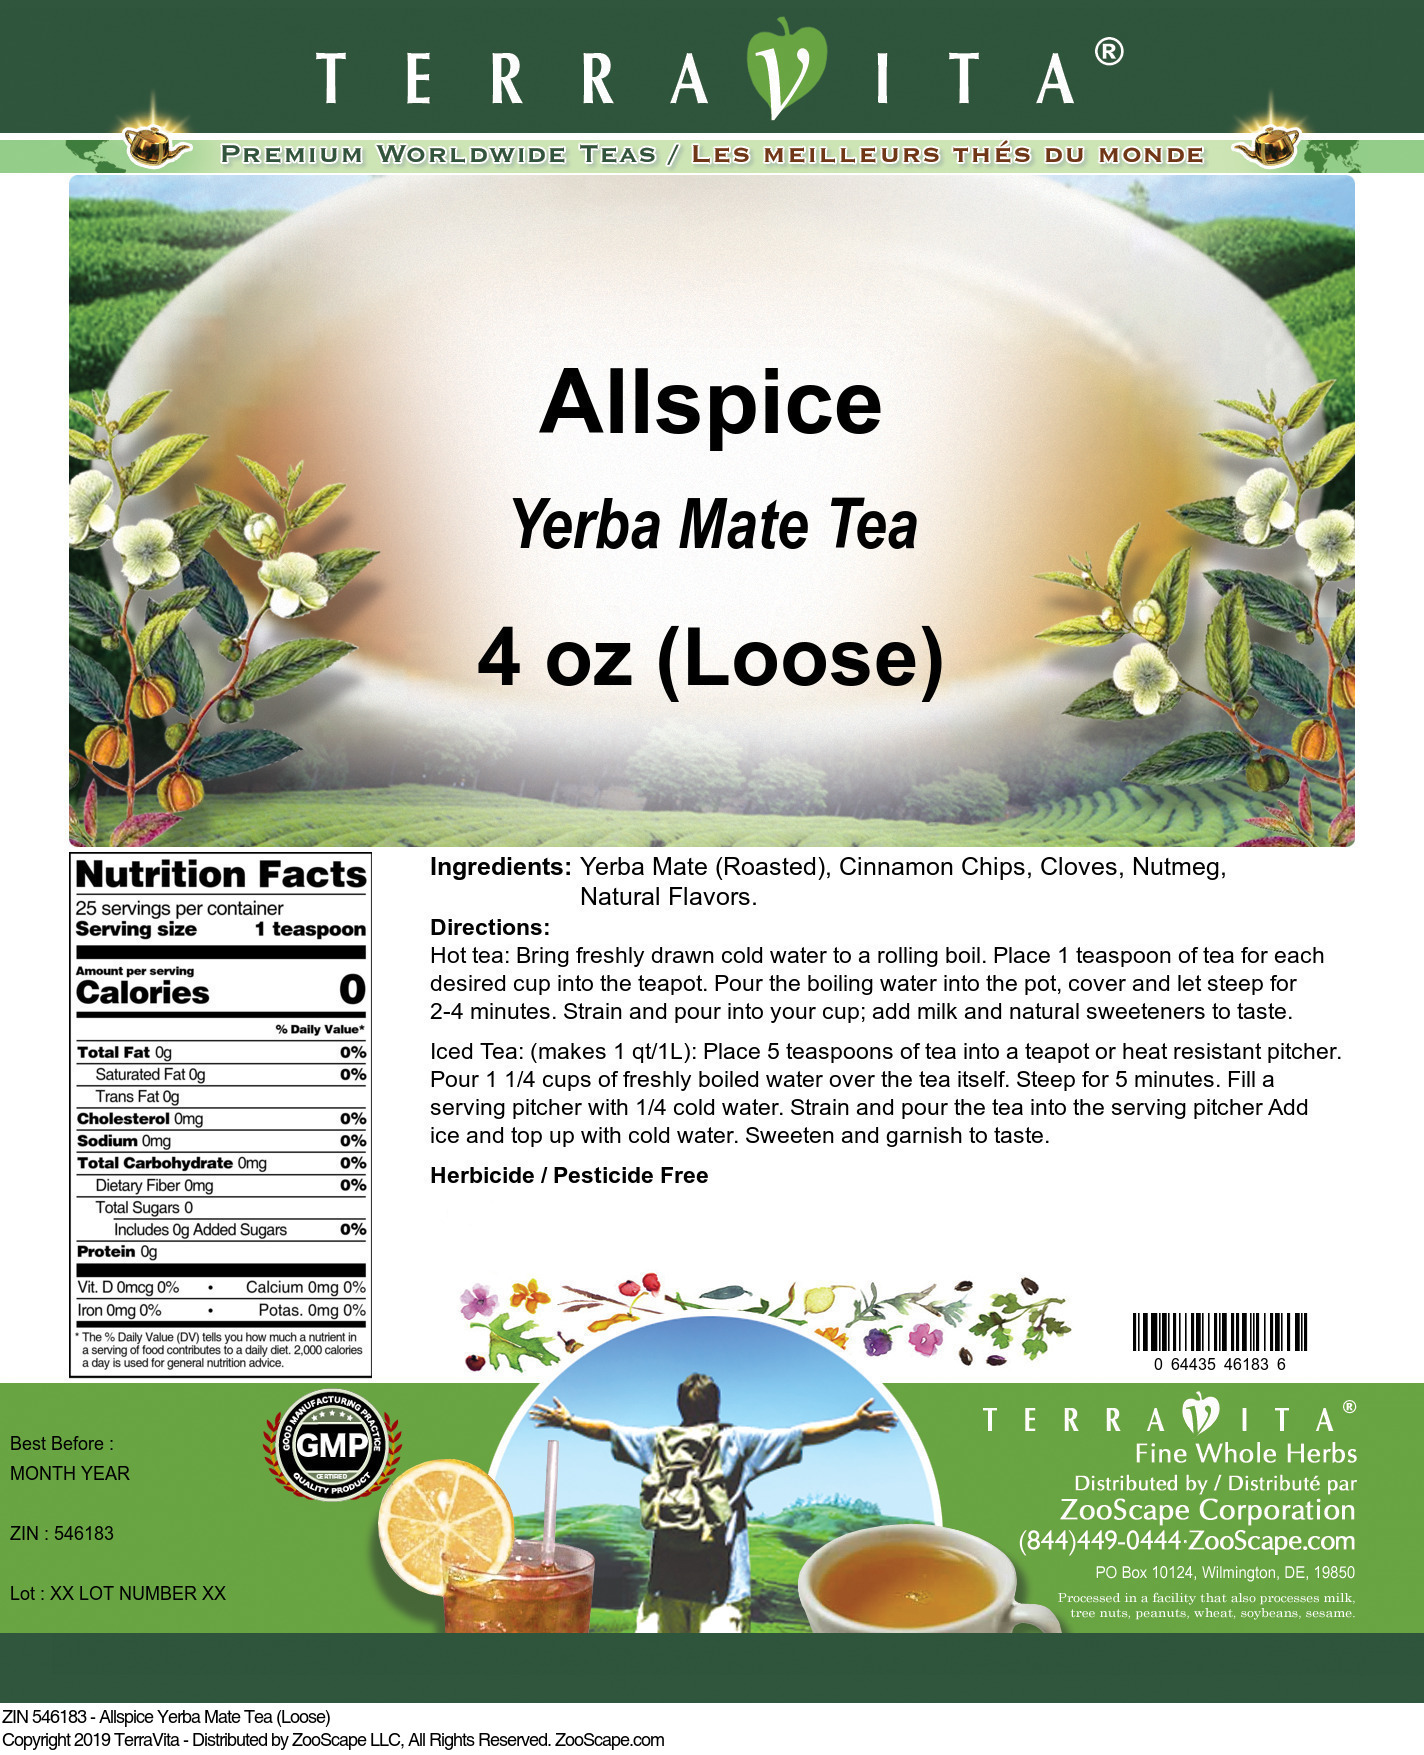 Allspice Yerba Mate Tea (Loose)